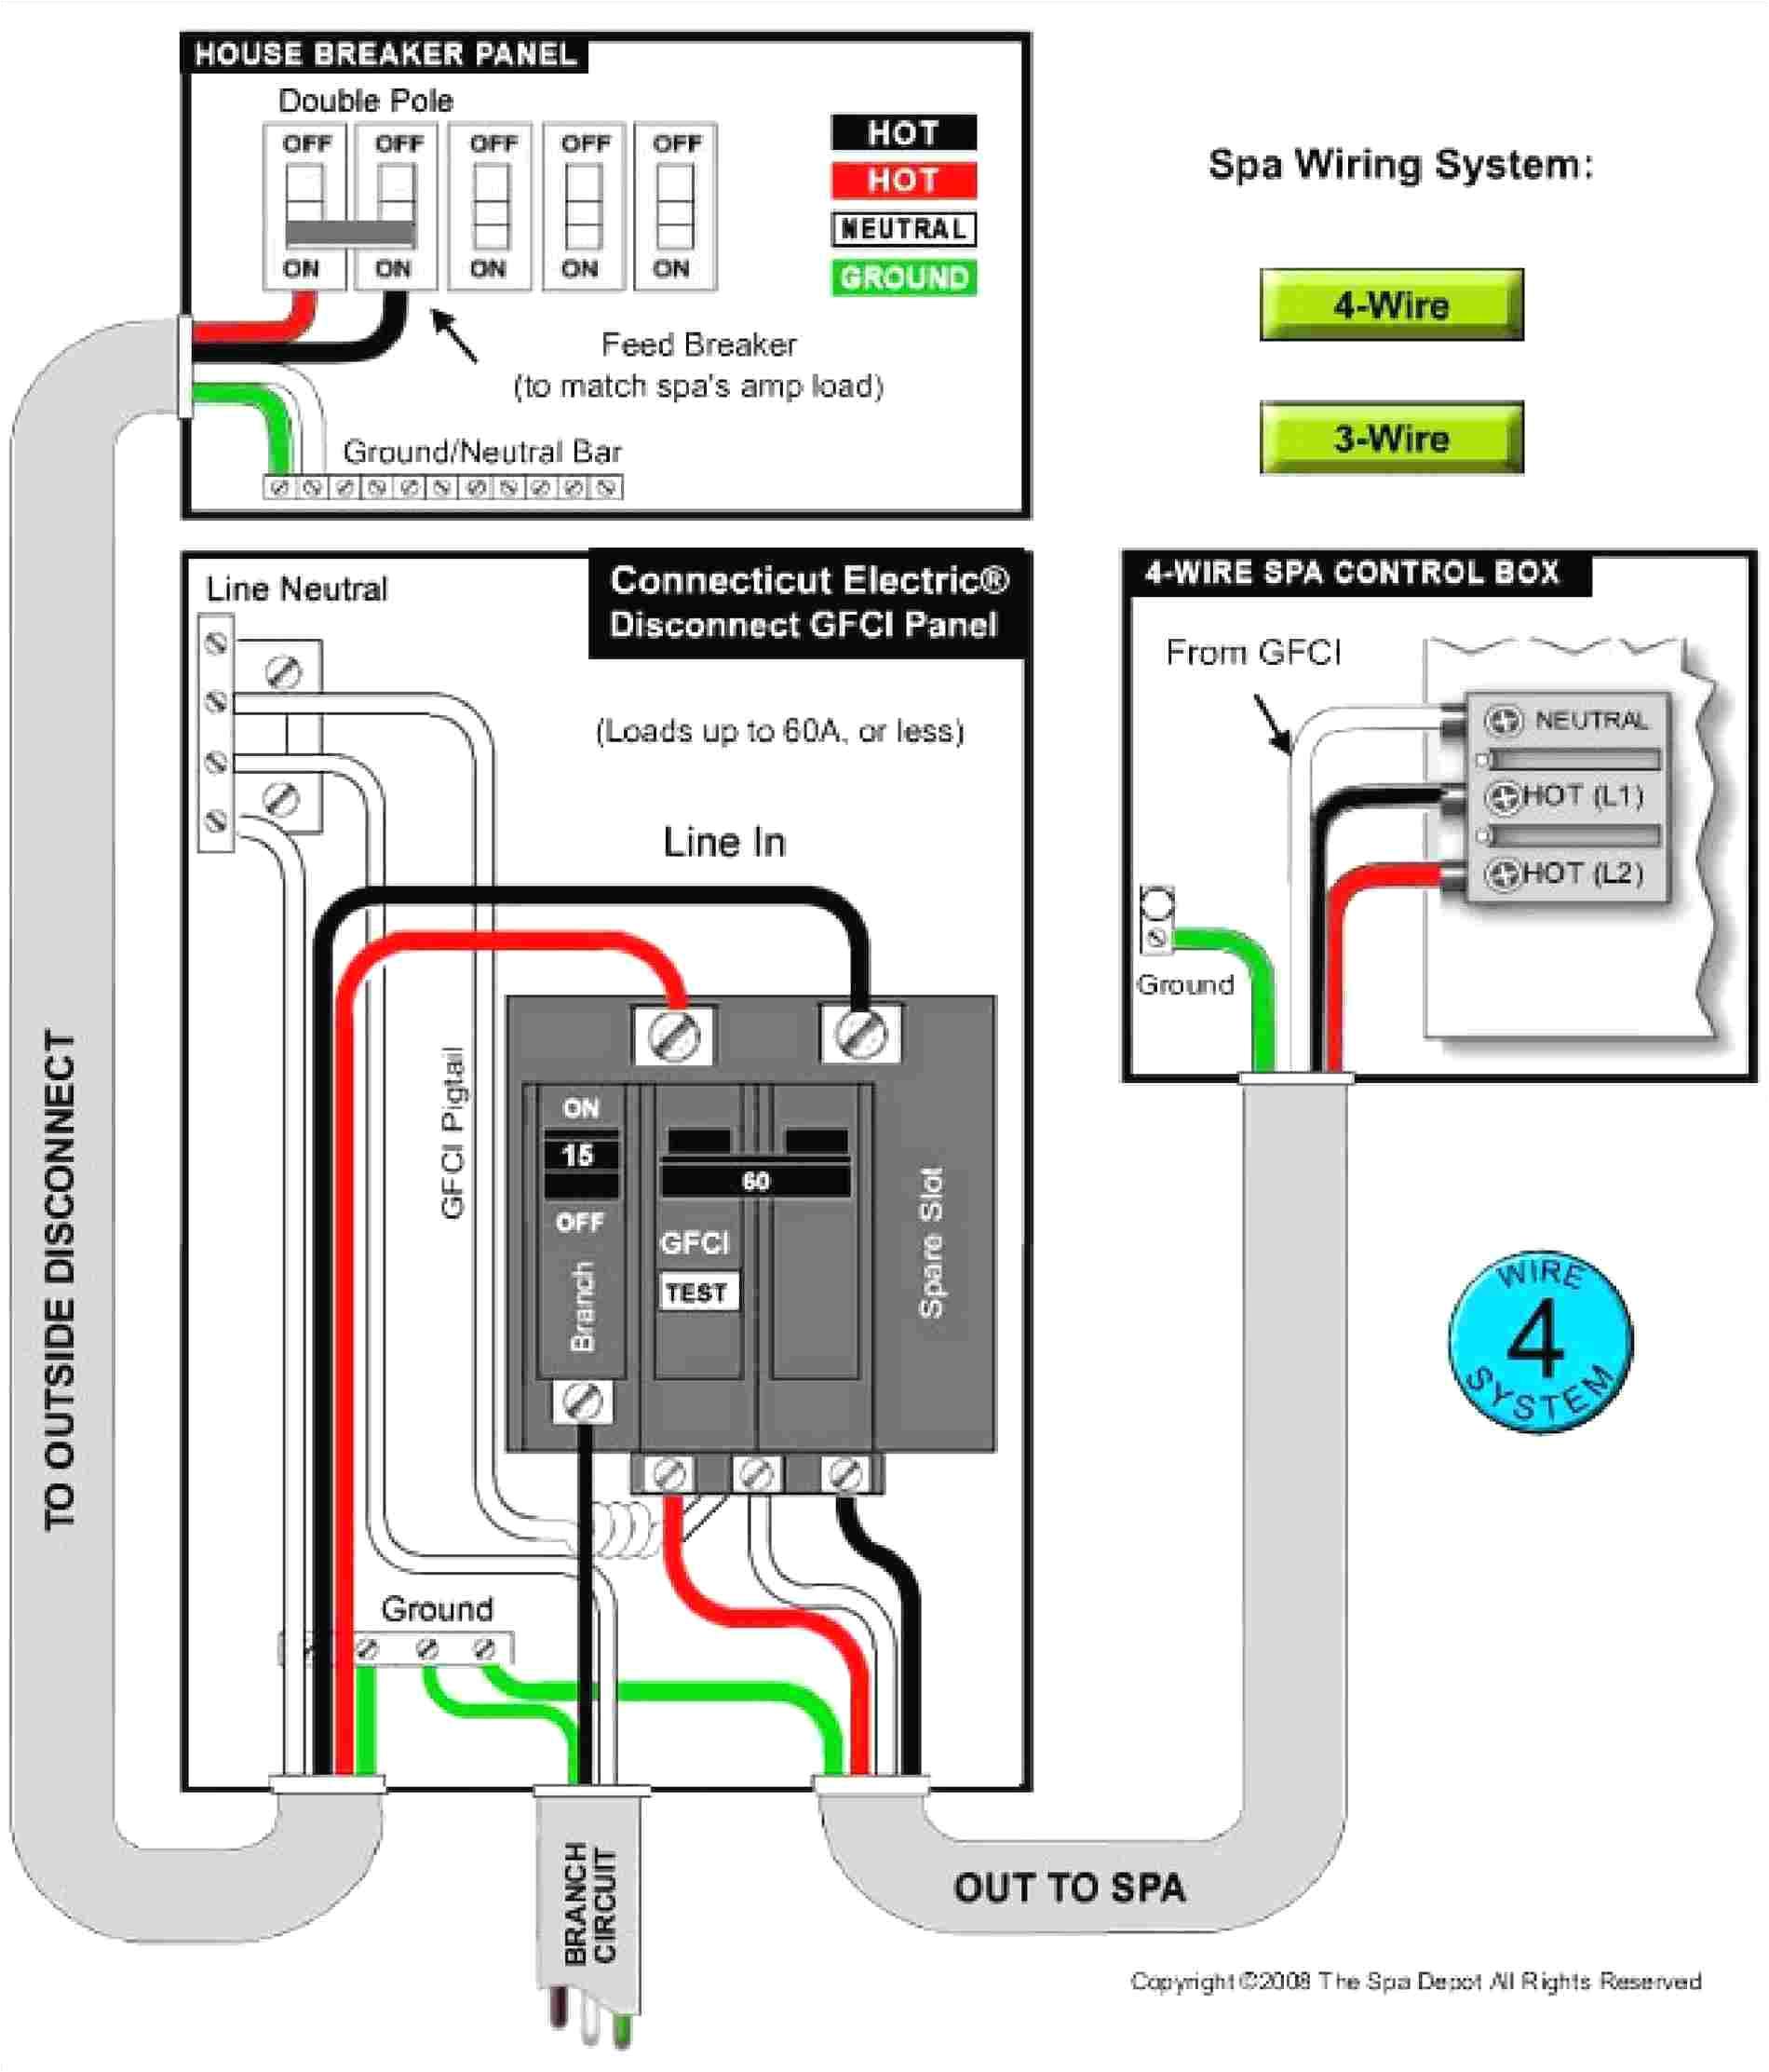 gfci wiring diagram 115v wiring diagram technic 115v breaker wiring diagram